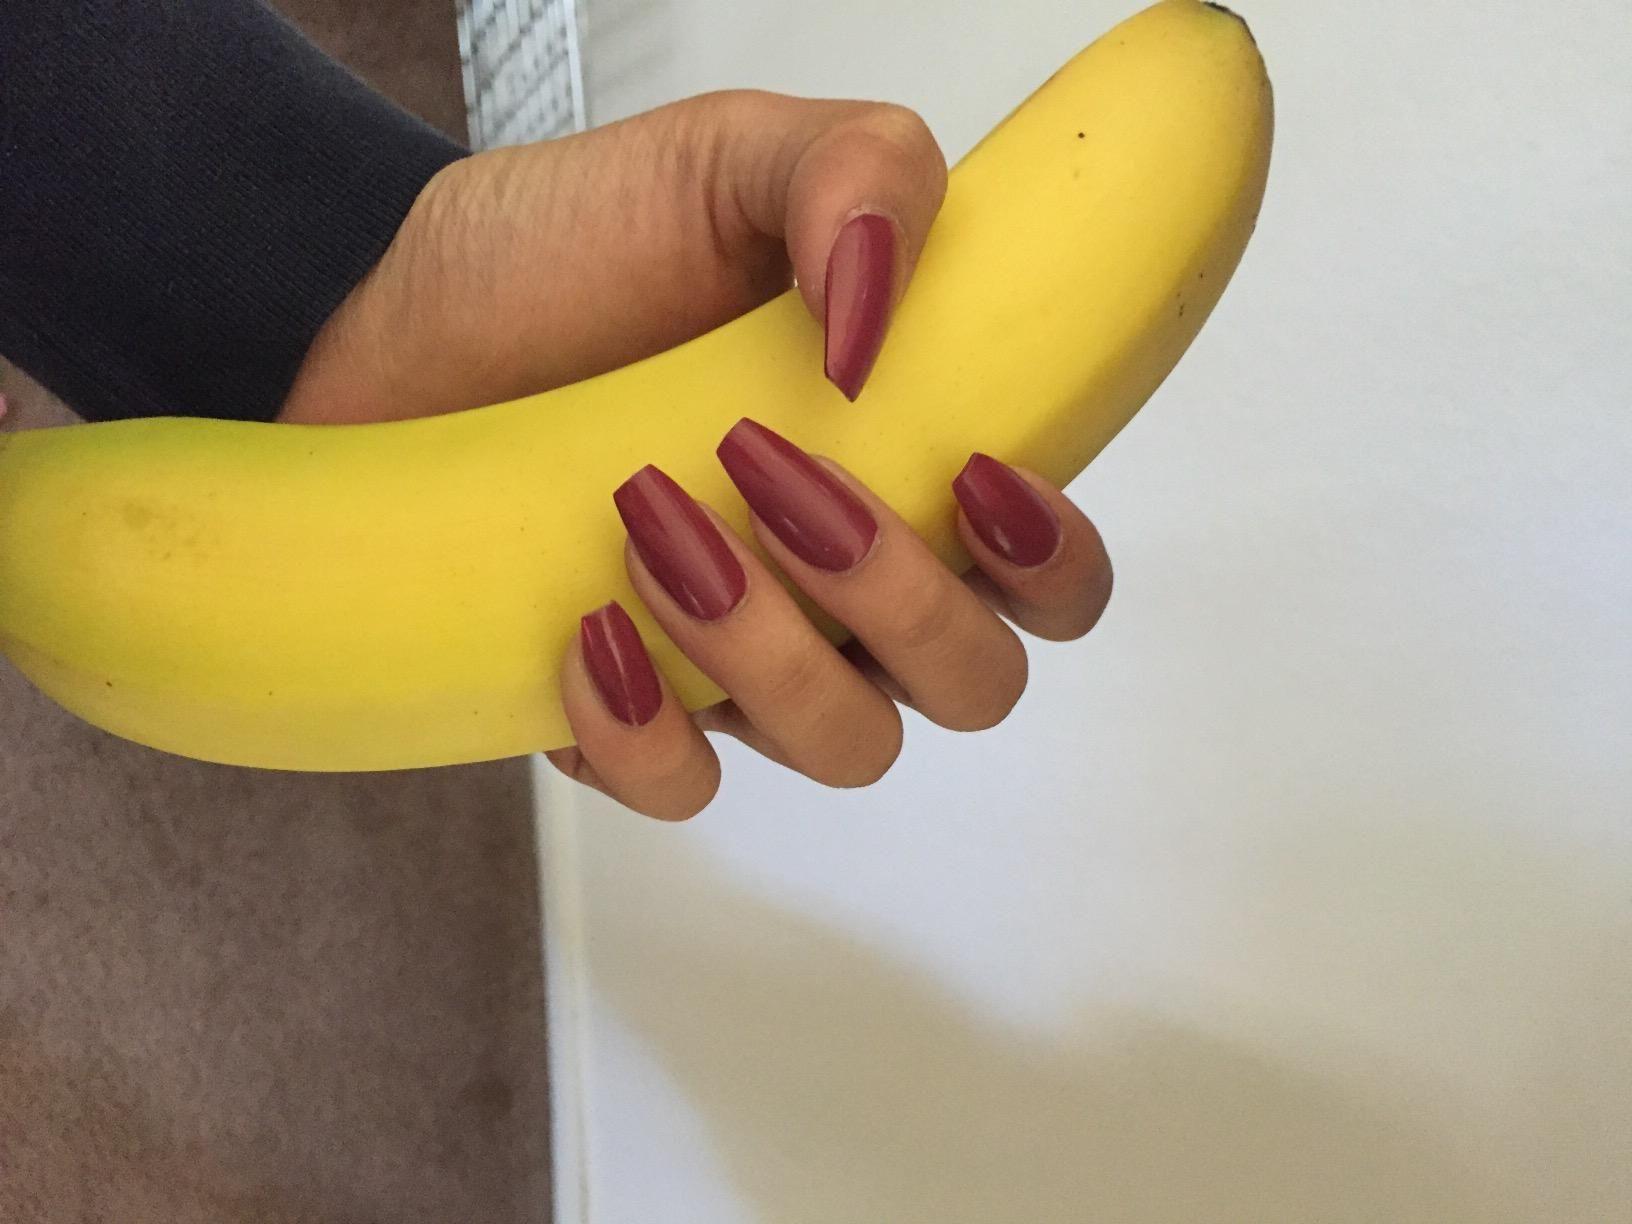 Full color nail art - Amazon Com Makartt 500 Tips Oval Full Cover Natural Color Nails Tips False